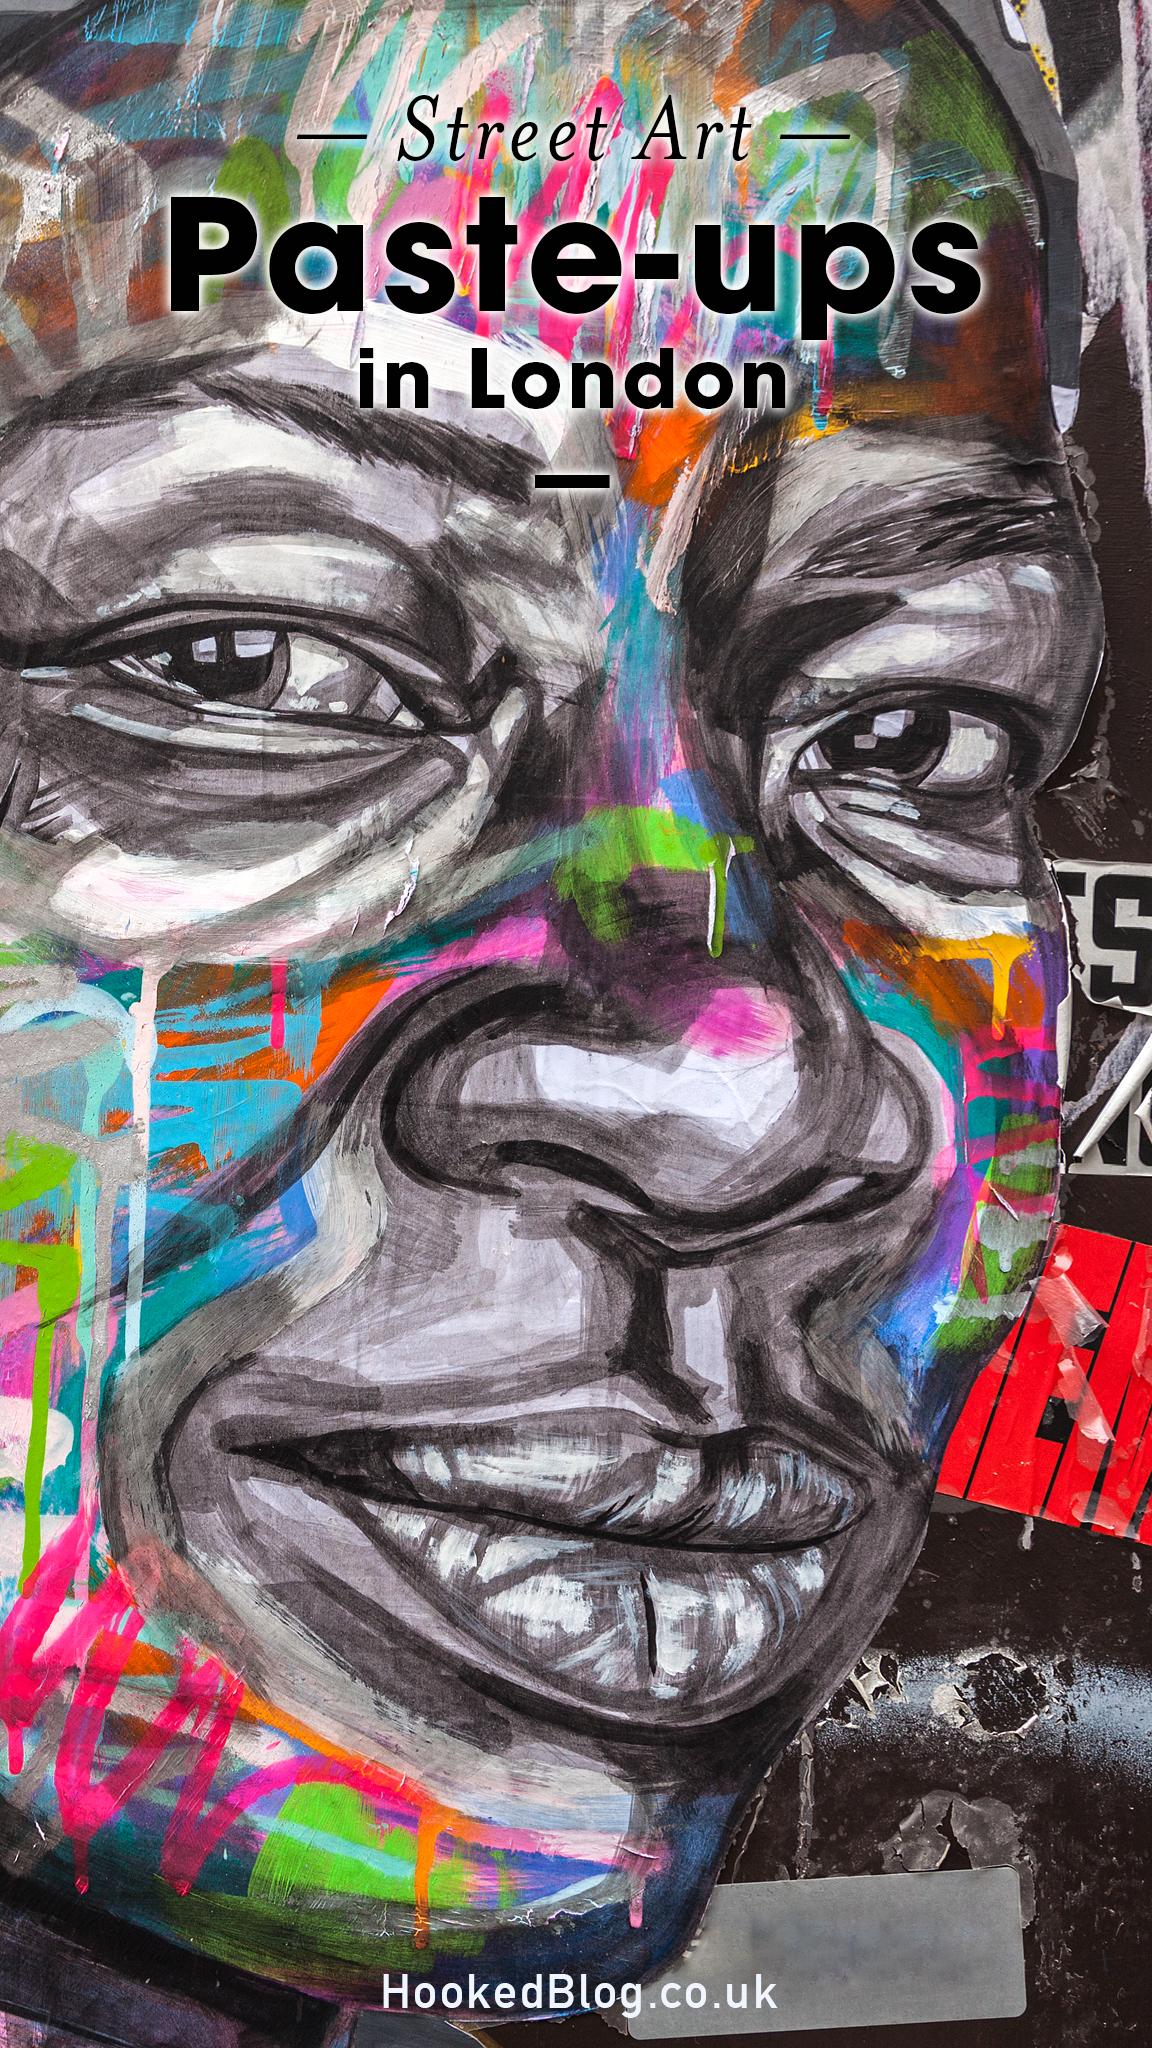 London Street Art Paste-ups in Shoreditch. #Streetart #Pasteups #Hookedblog